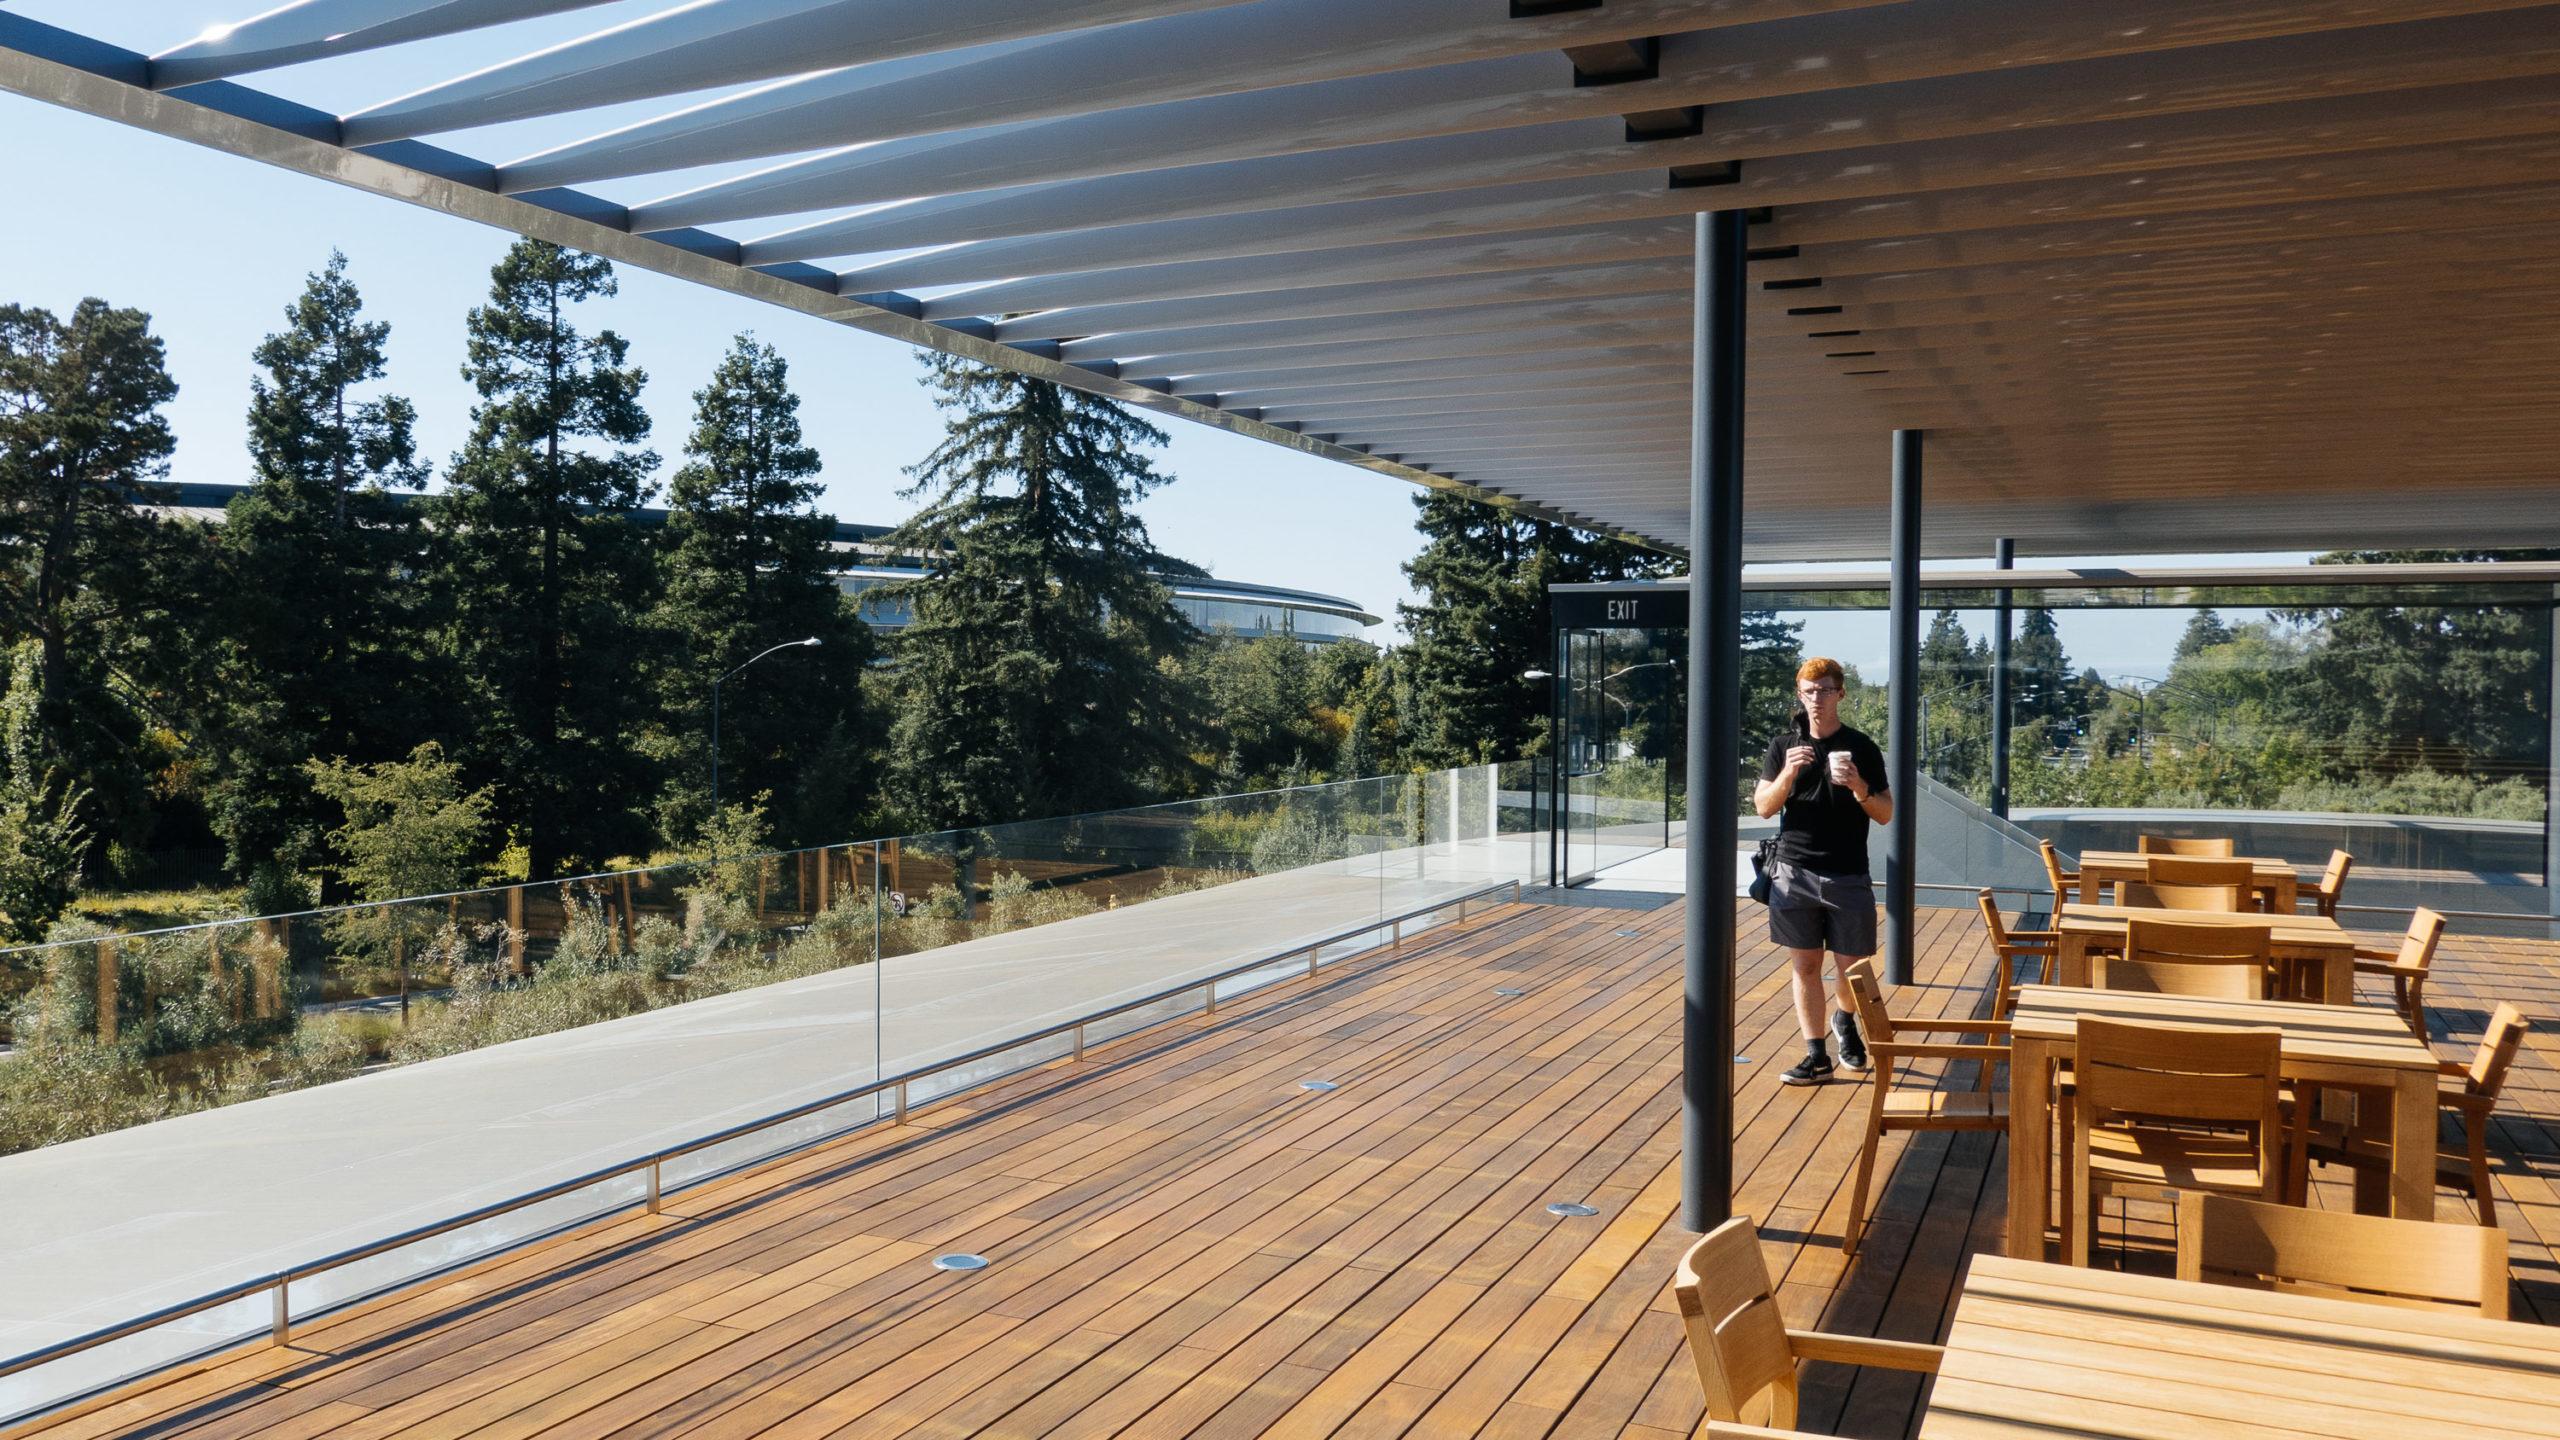 A deck overlooking Apple Park